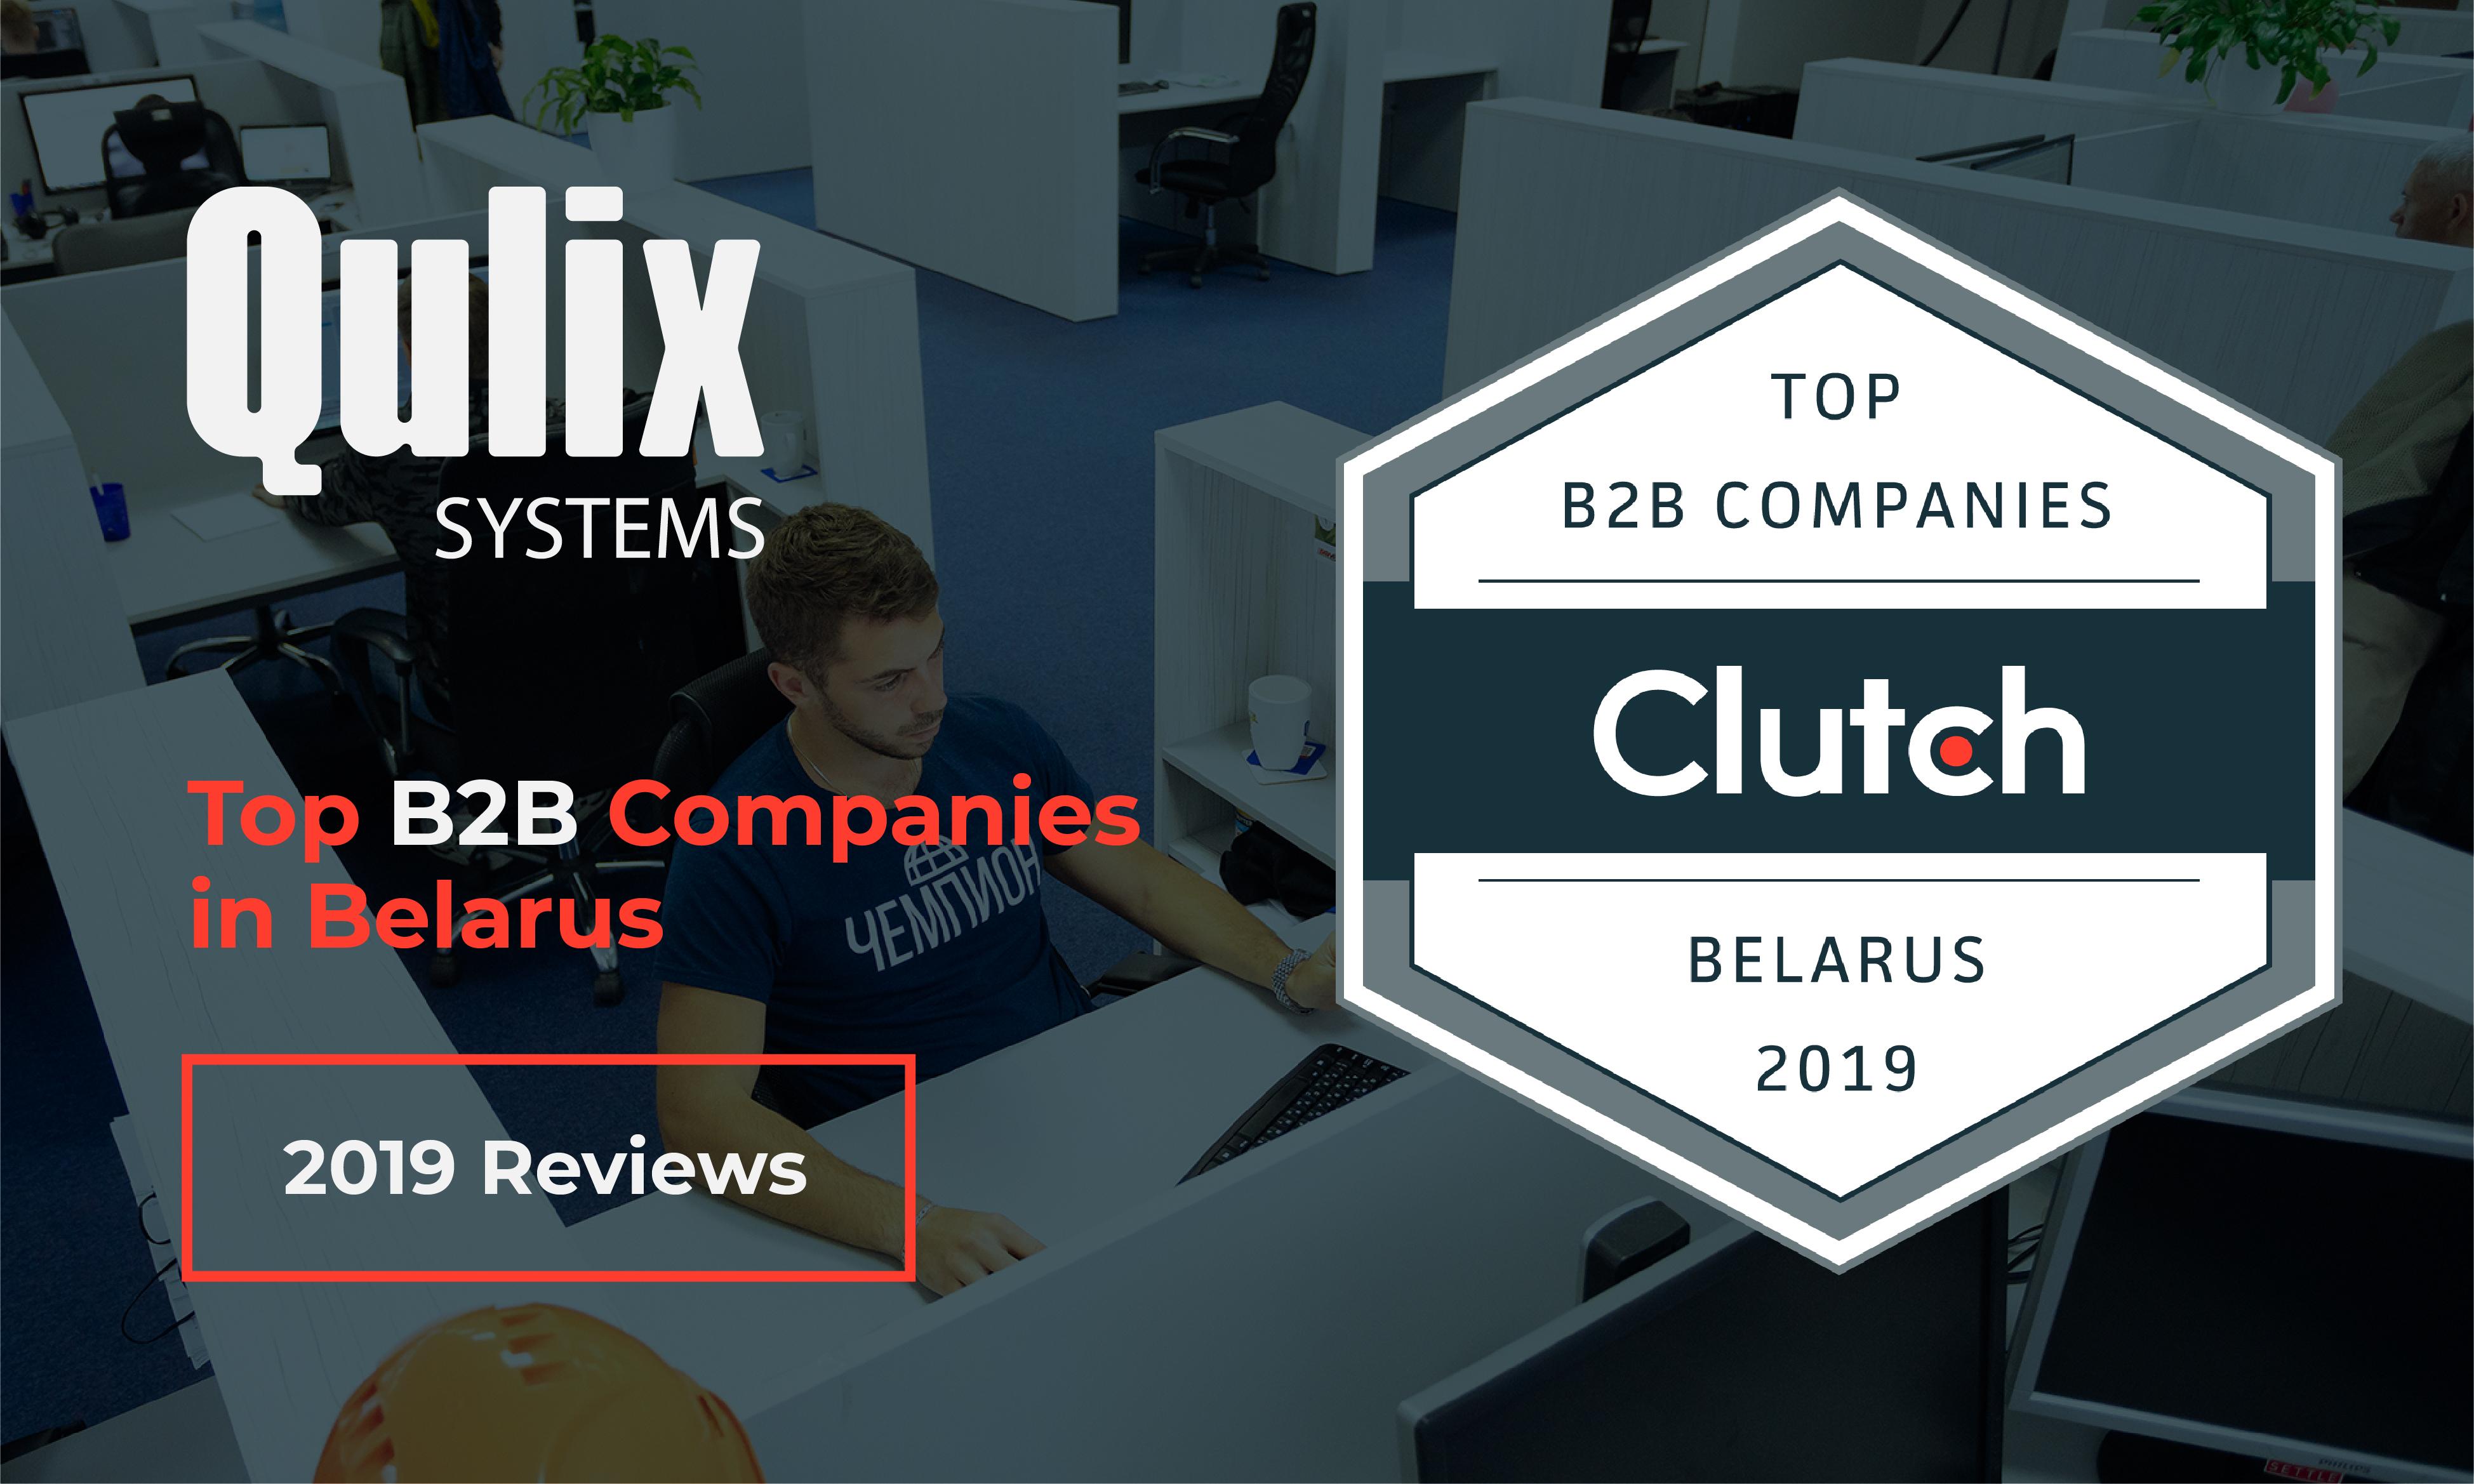 clutch top softclutch top developer in belarus b2b 2019ware developers b2b belarus 2019